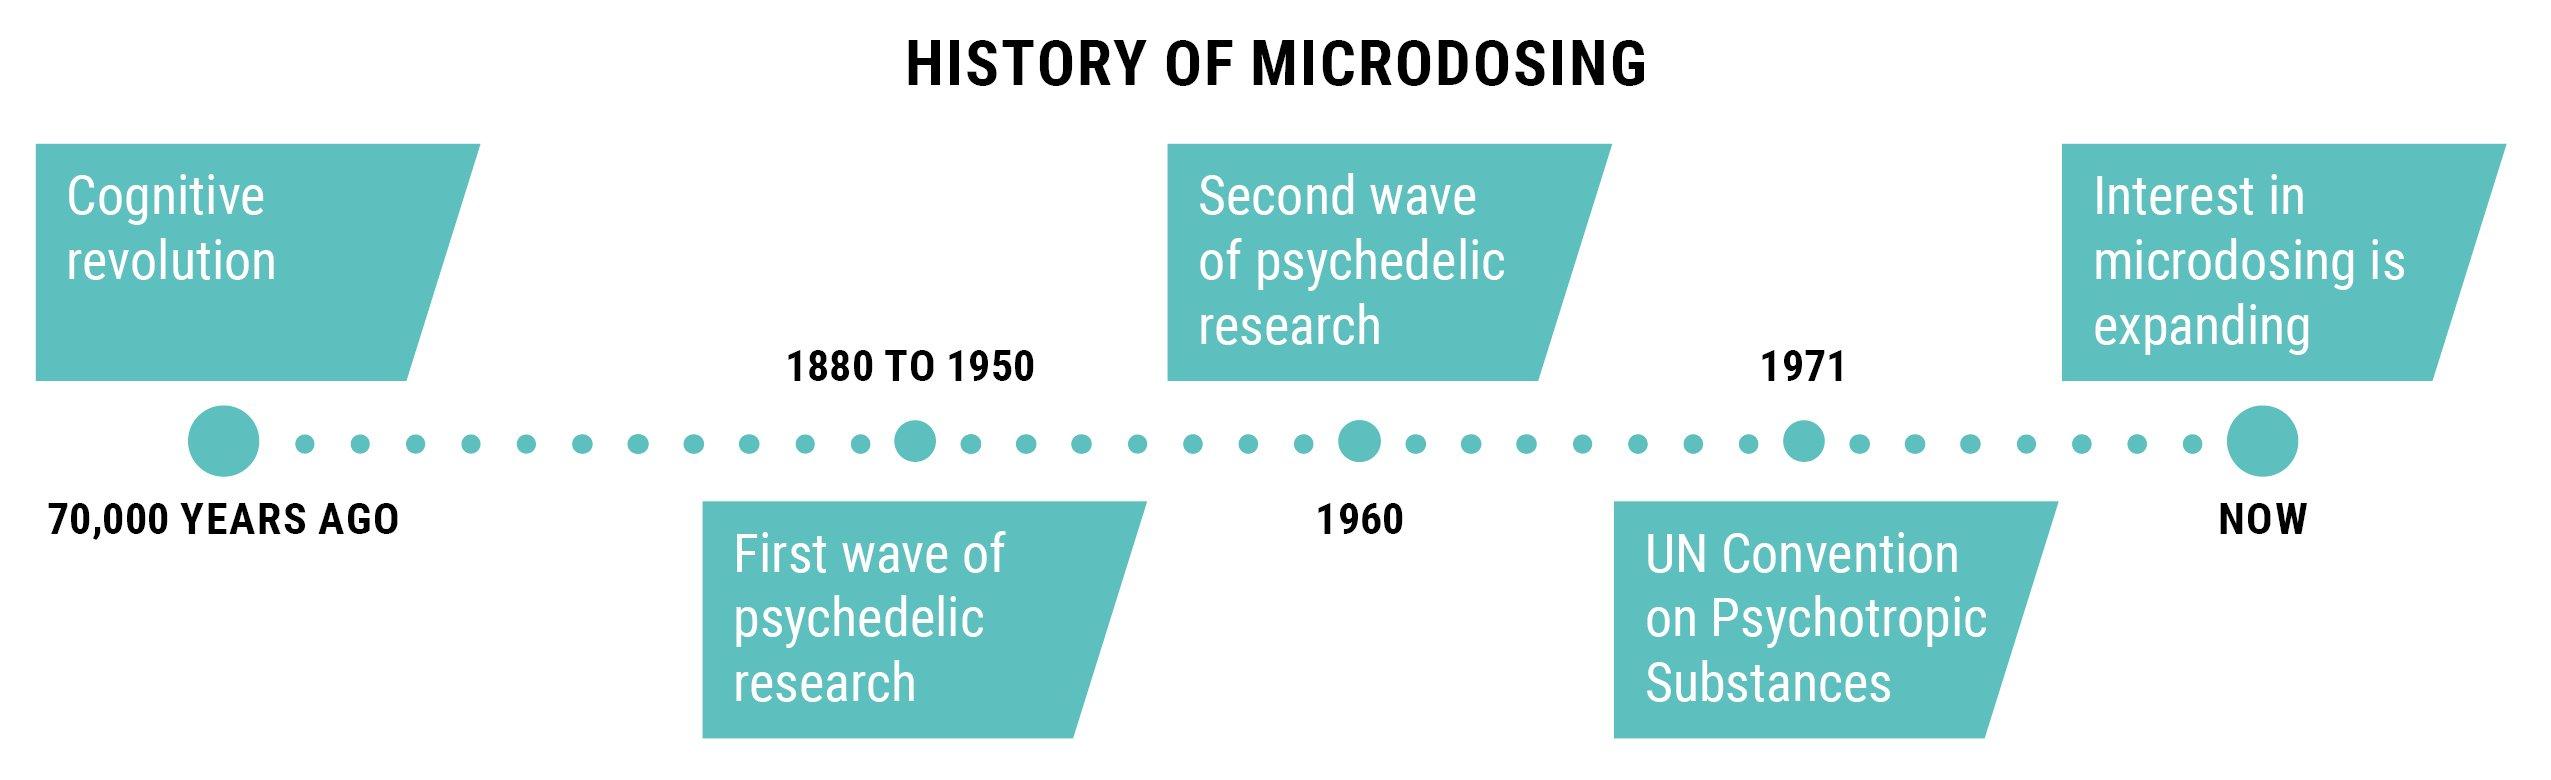 HISTORY OF MICRODOSING